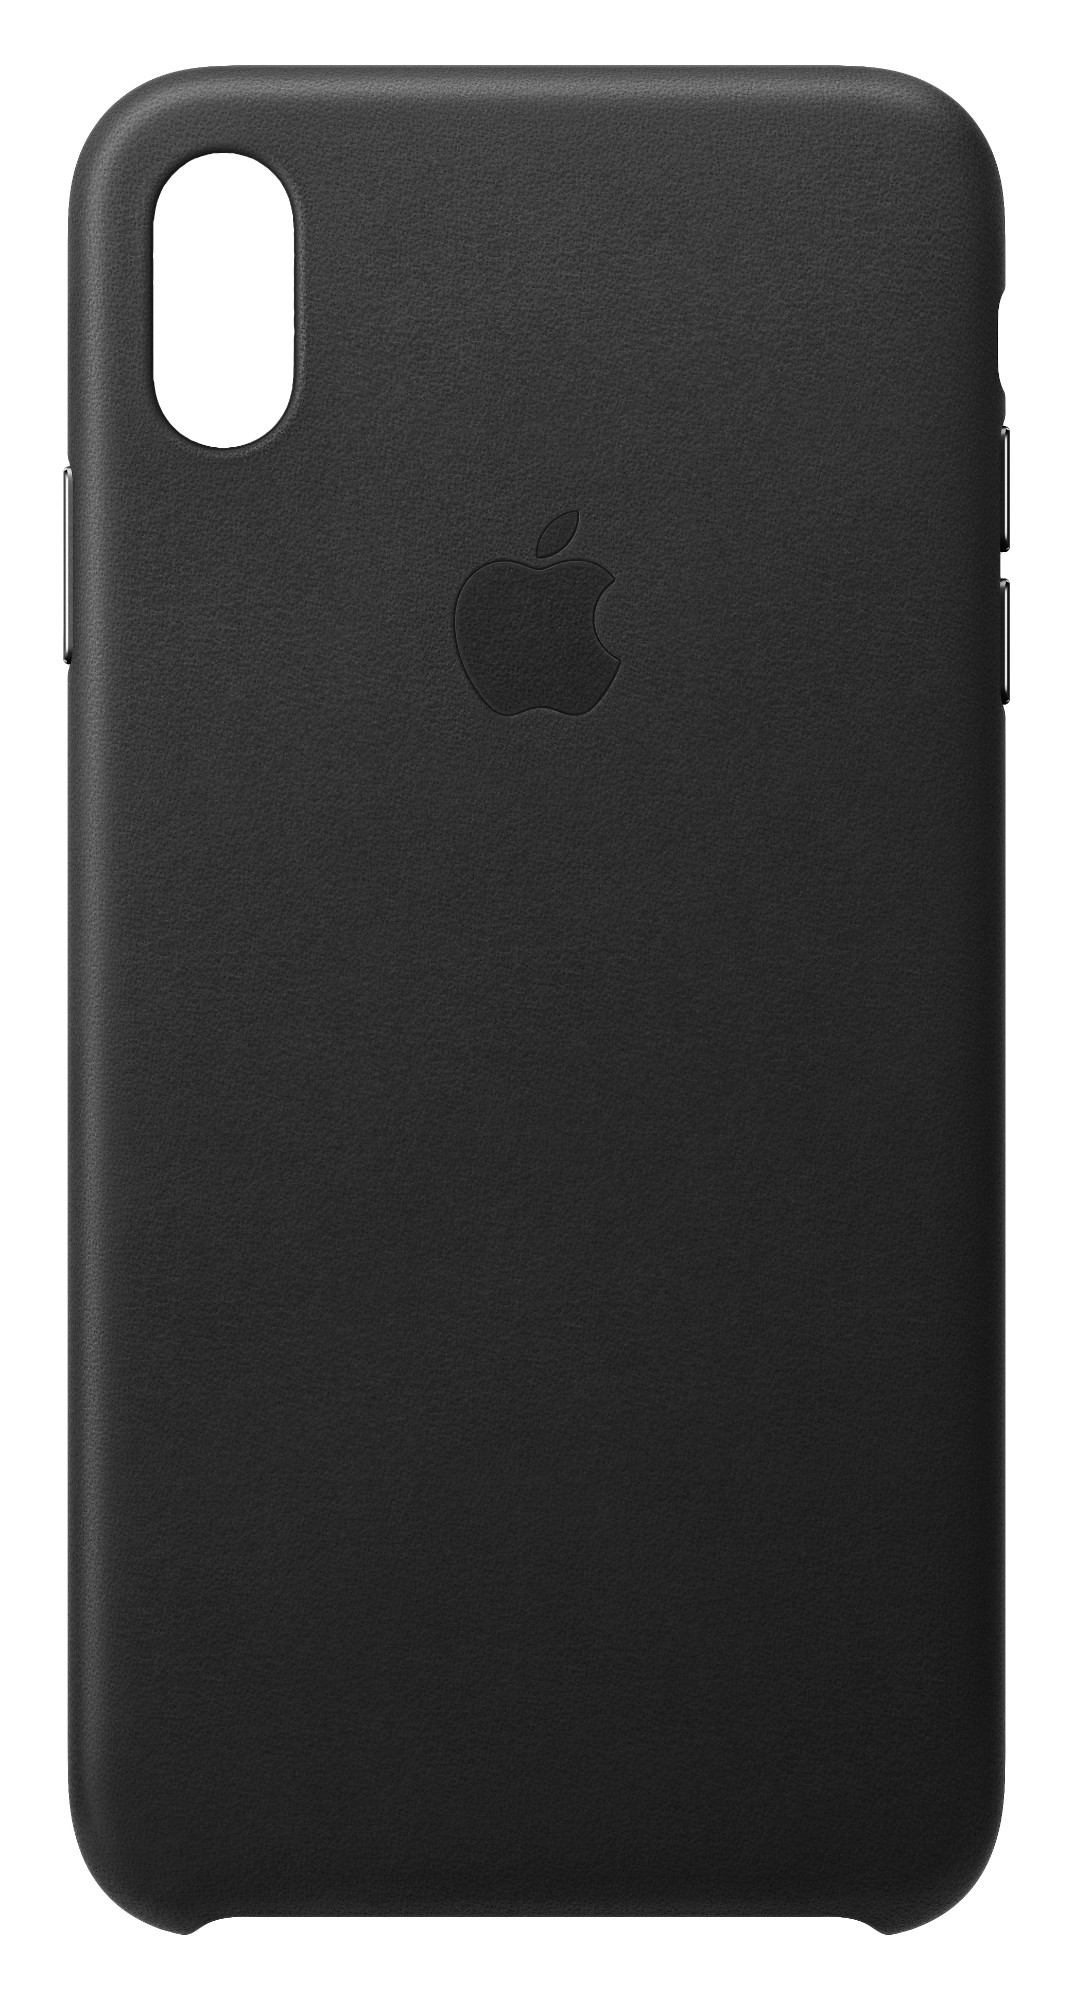 "Apple MRWT2ZM/A funda para teléfono móvil 16,5 cm (6.5"") Negro"